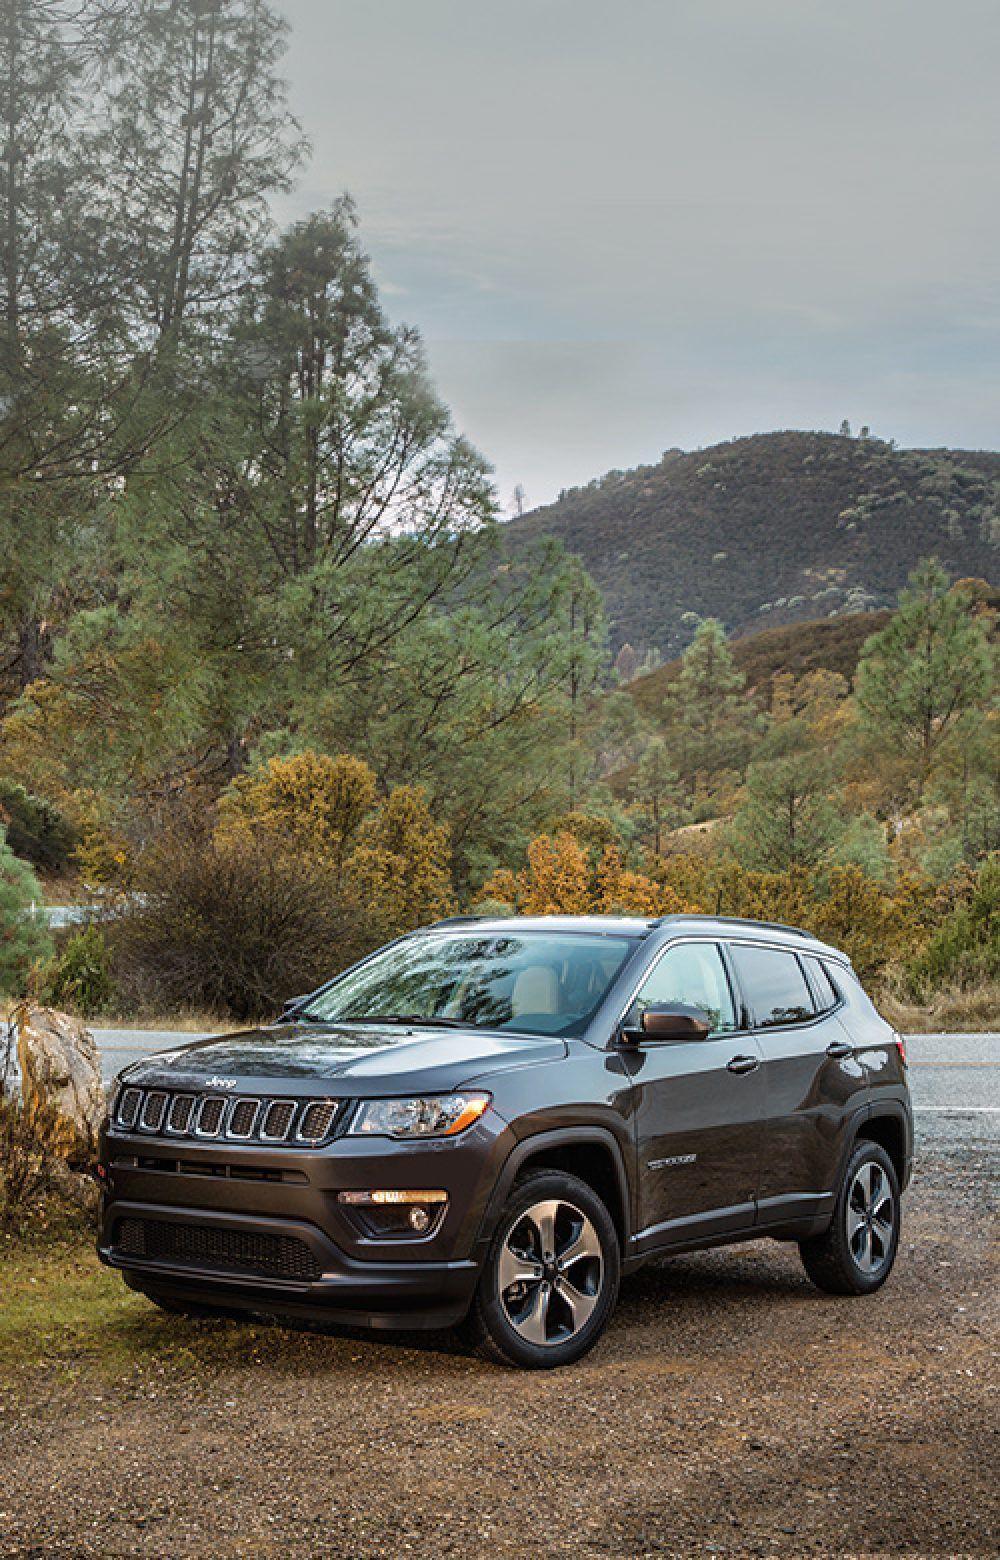 2019 Jeep Compass Liberate The Spirit Jeep Compass Suv Dream Cars